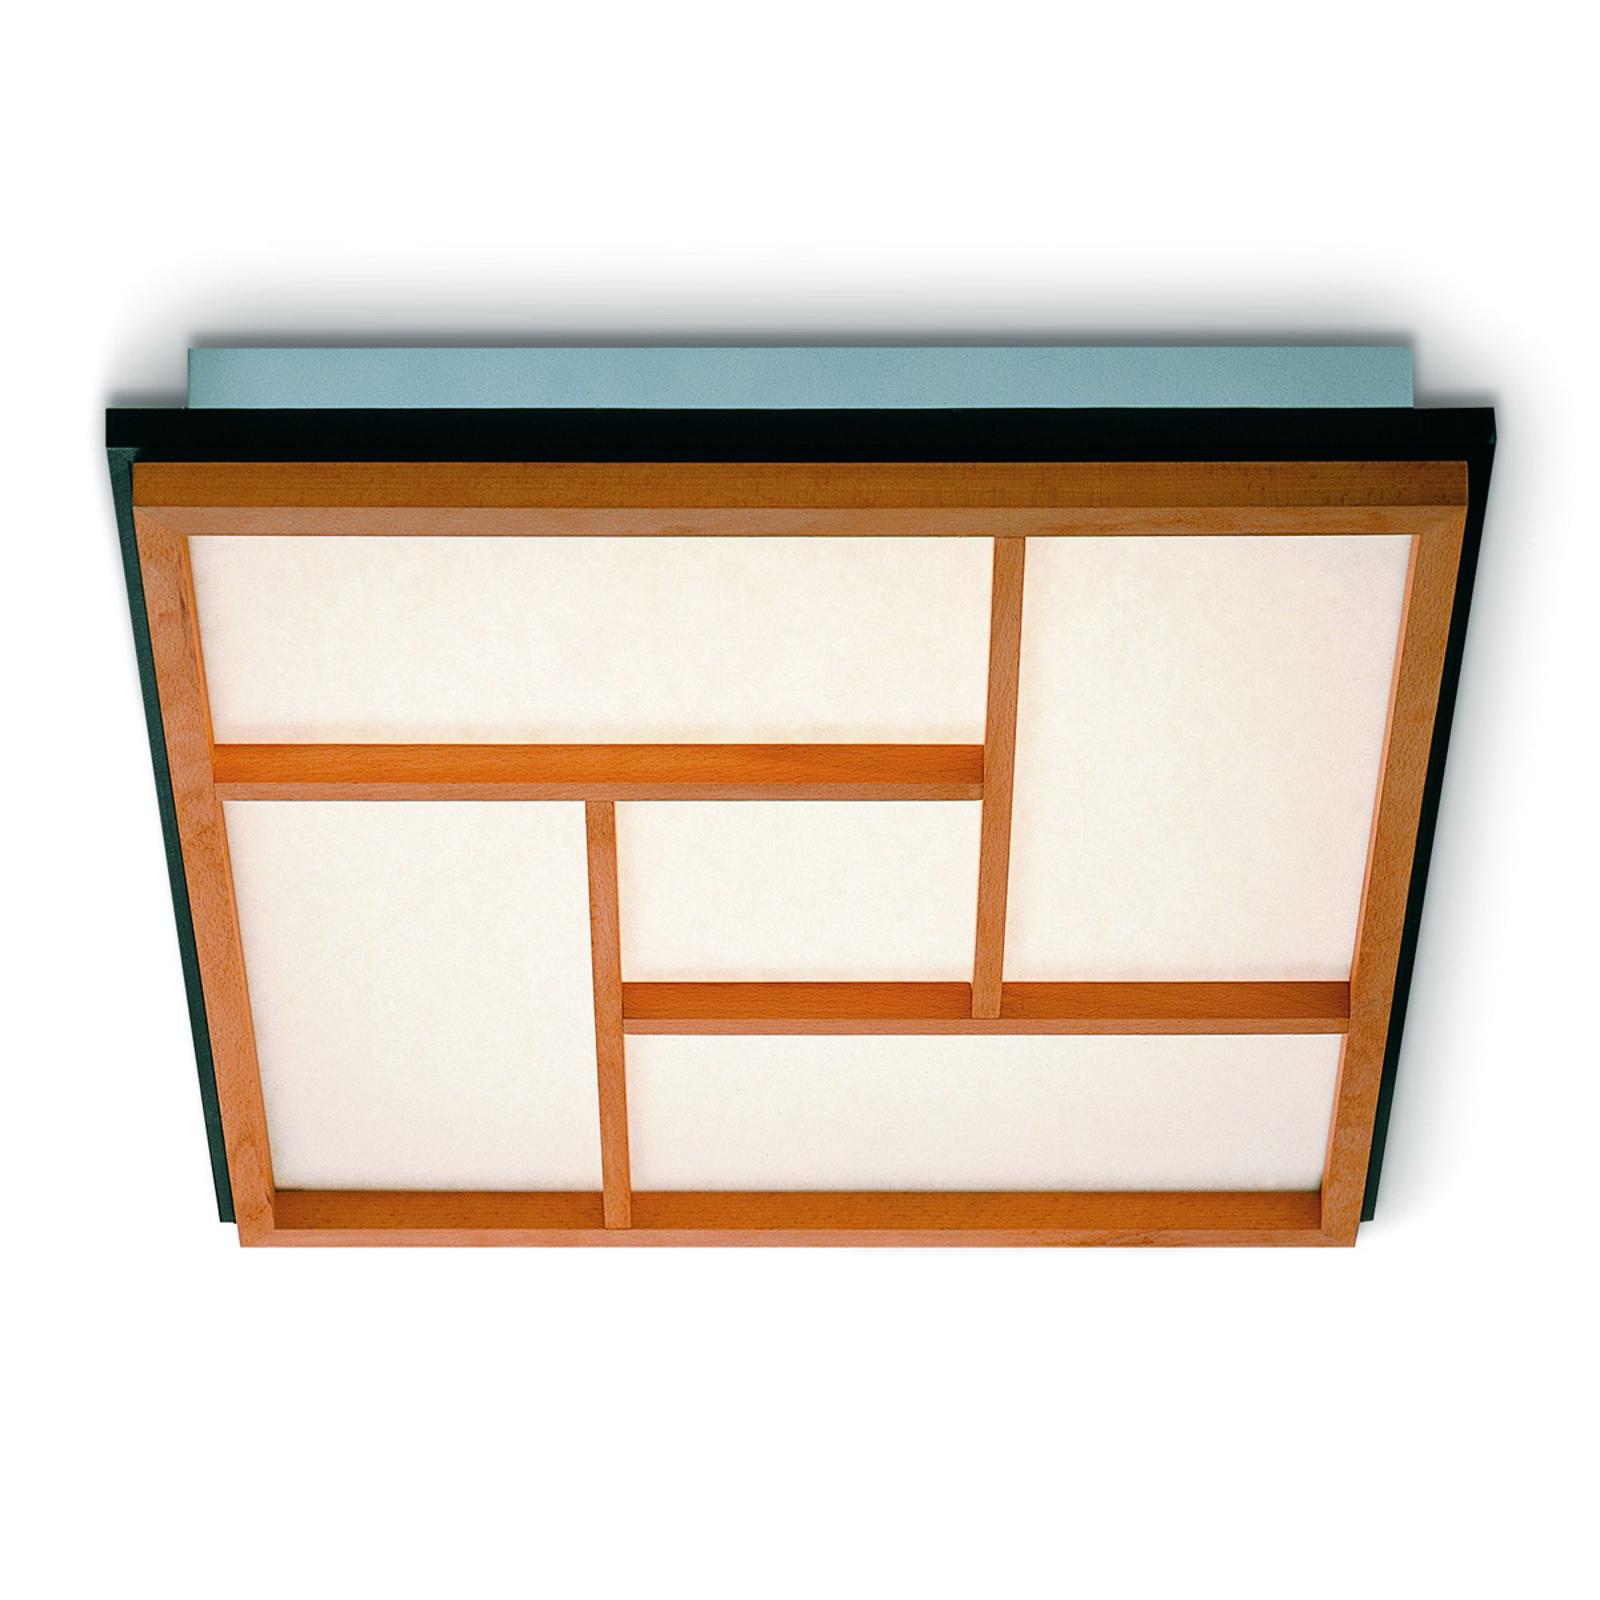 Kioto 5 – LED-taklampe i bøk